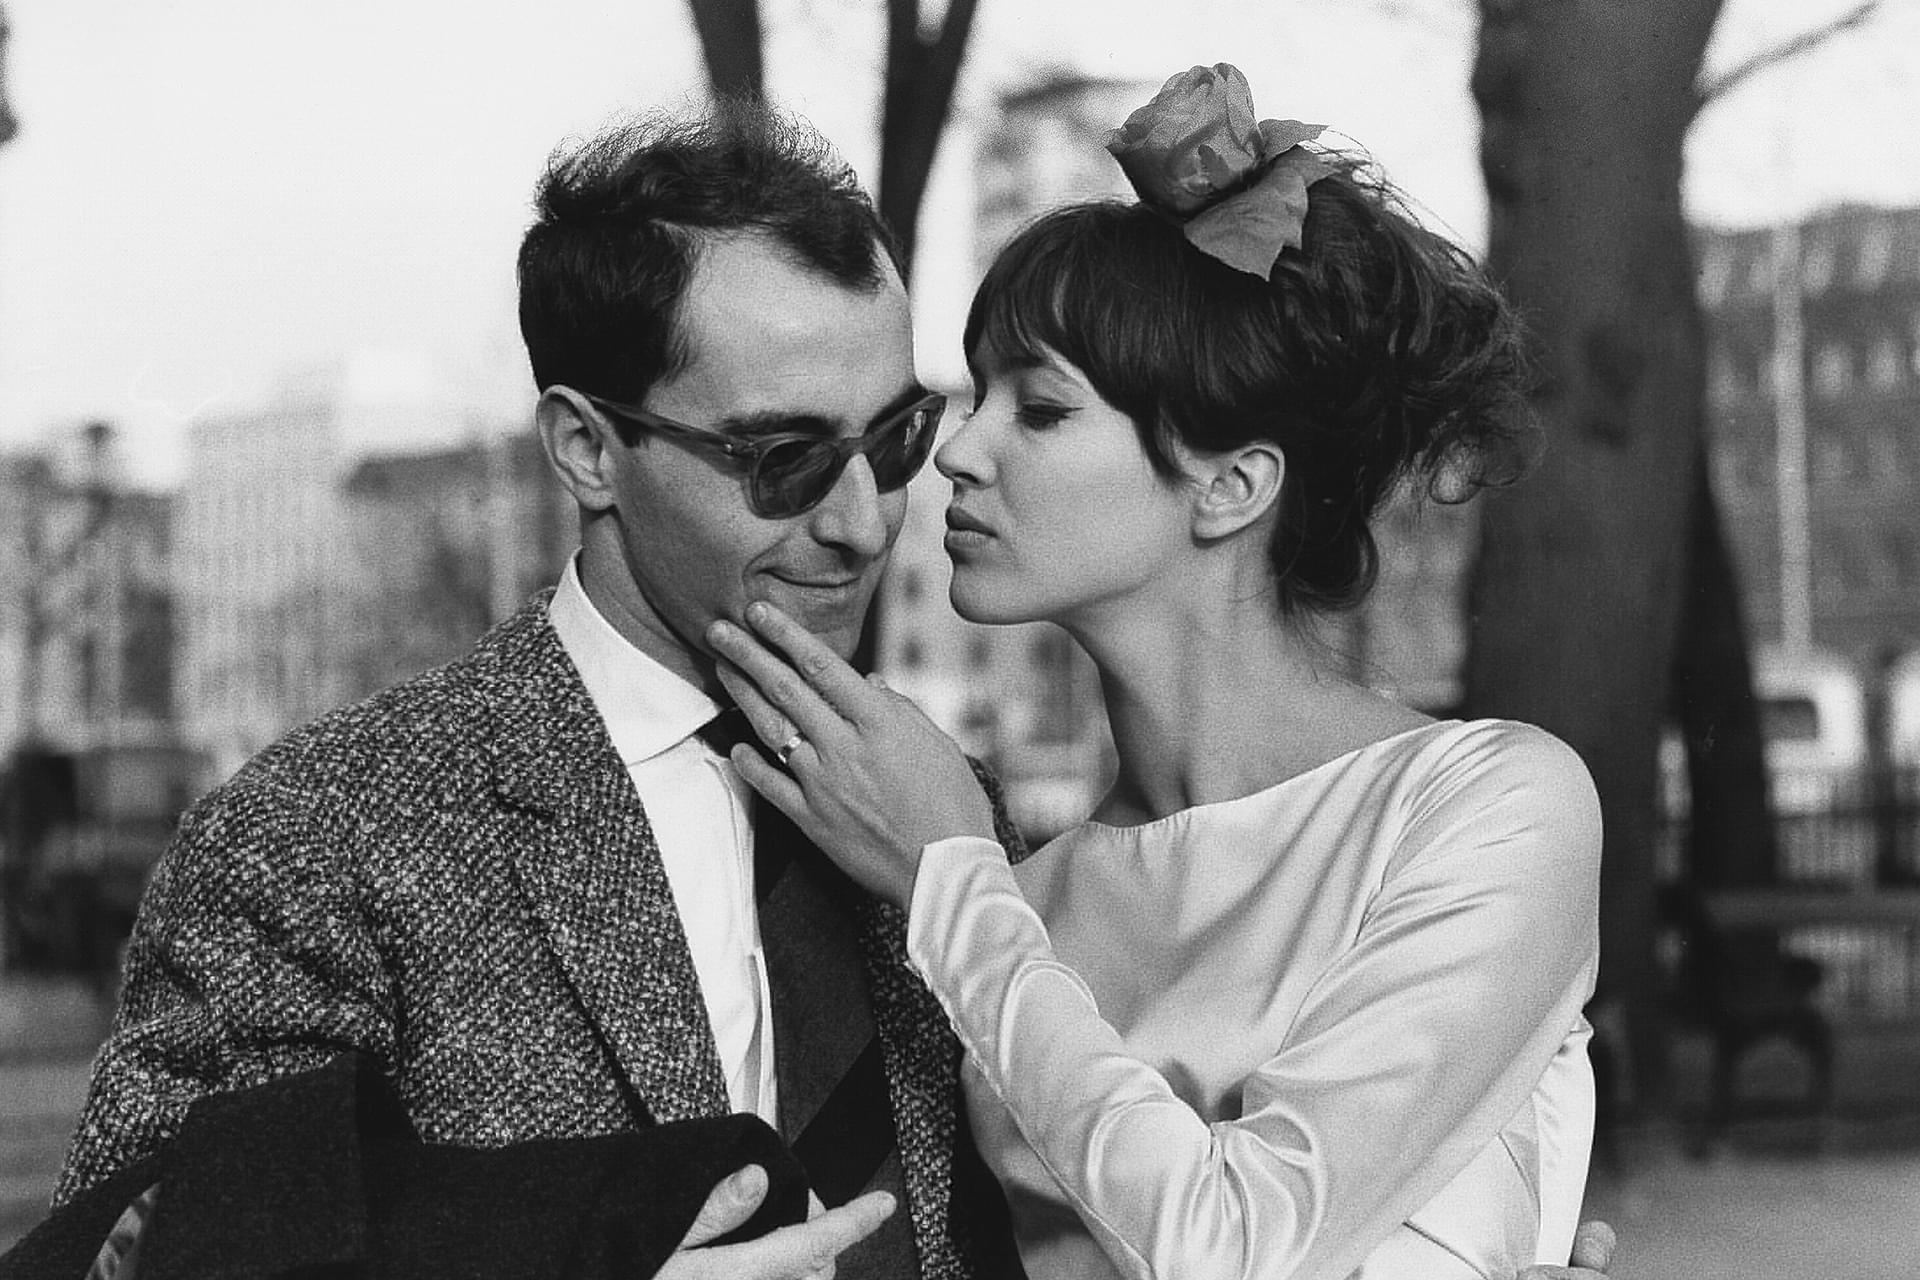 Anna Karina at her wedding to Jean-Luc Godard March 7, 1961 in Switzerland via @GettyImages